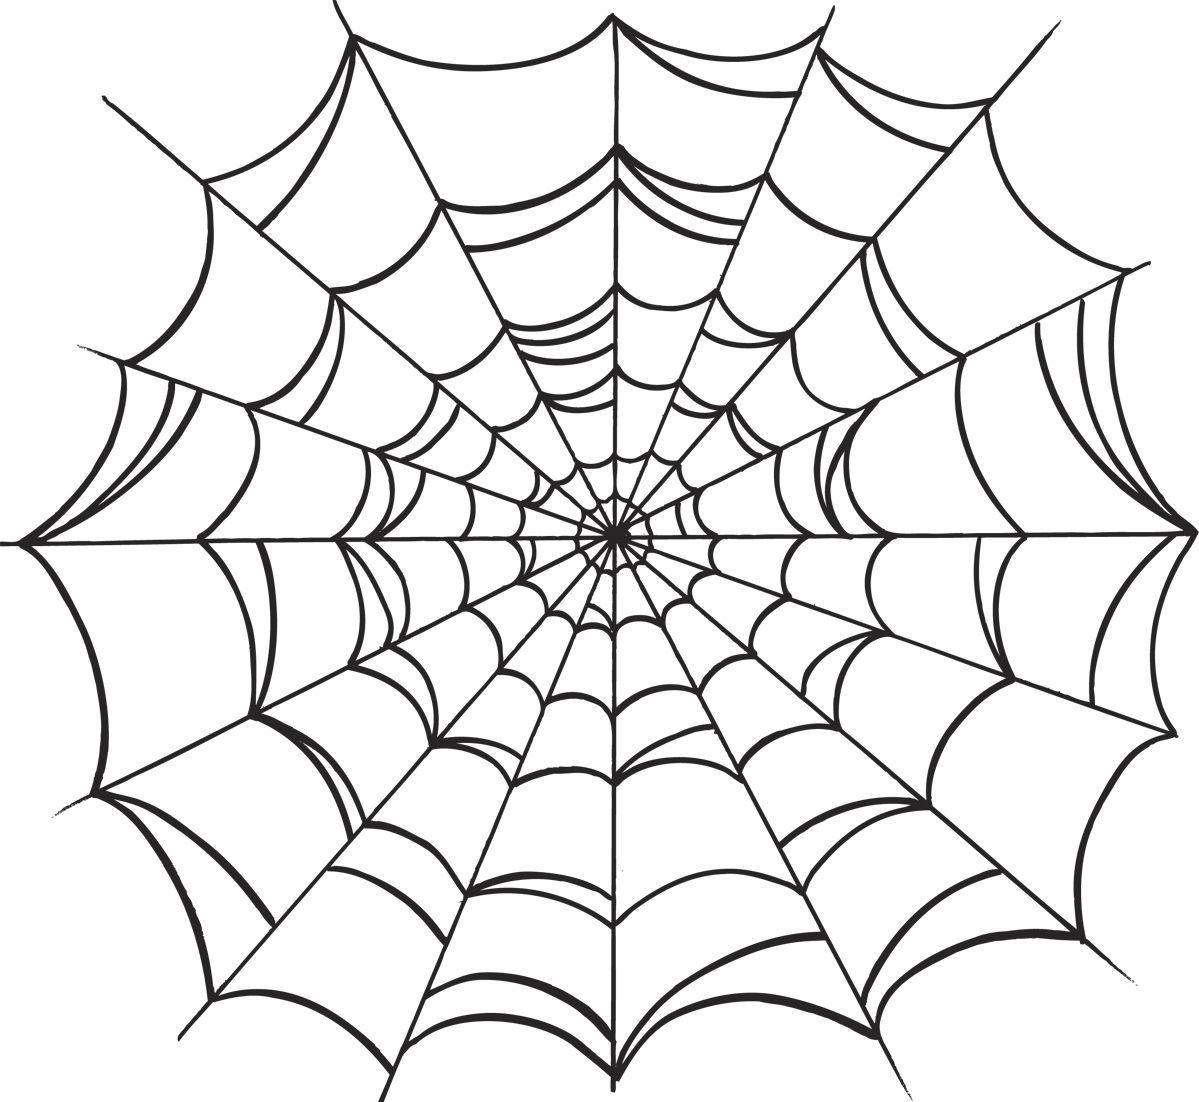 паутина эскиз рисунок